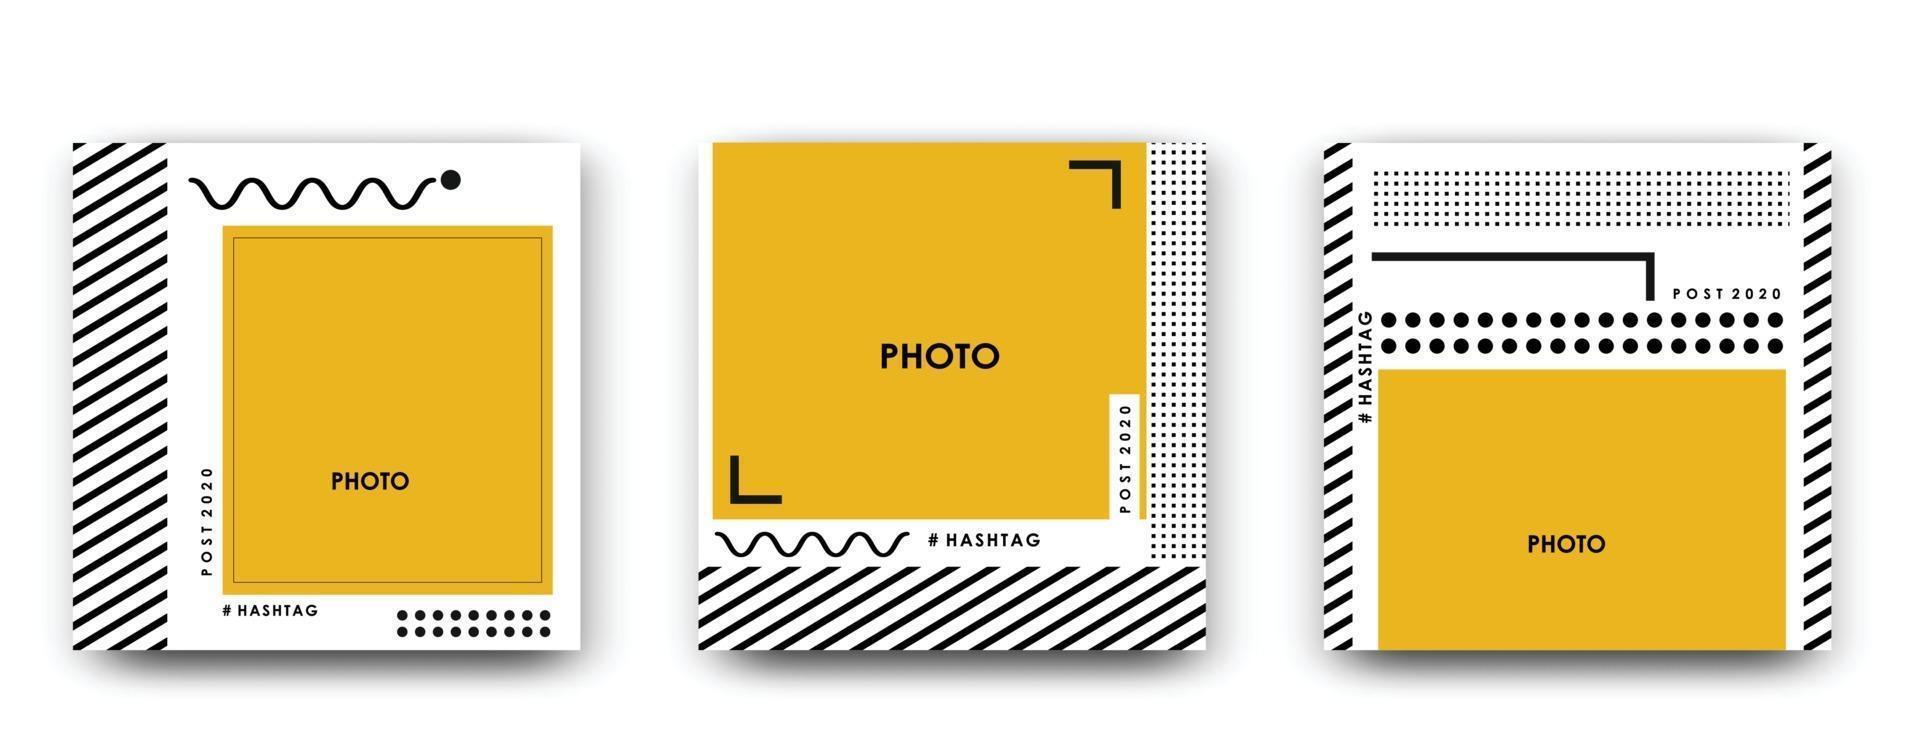 Photo square frame. Vector illustration